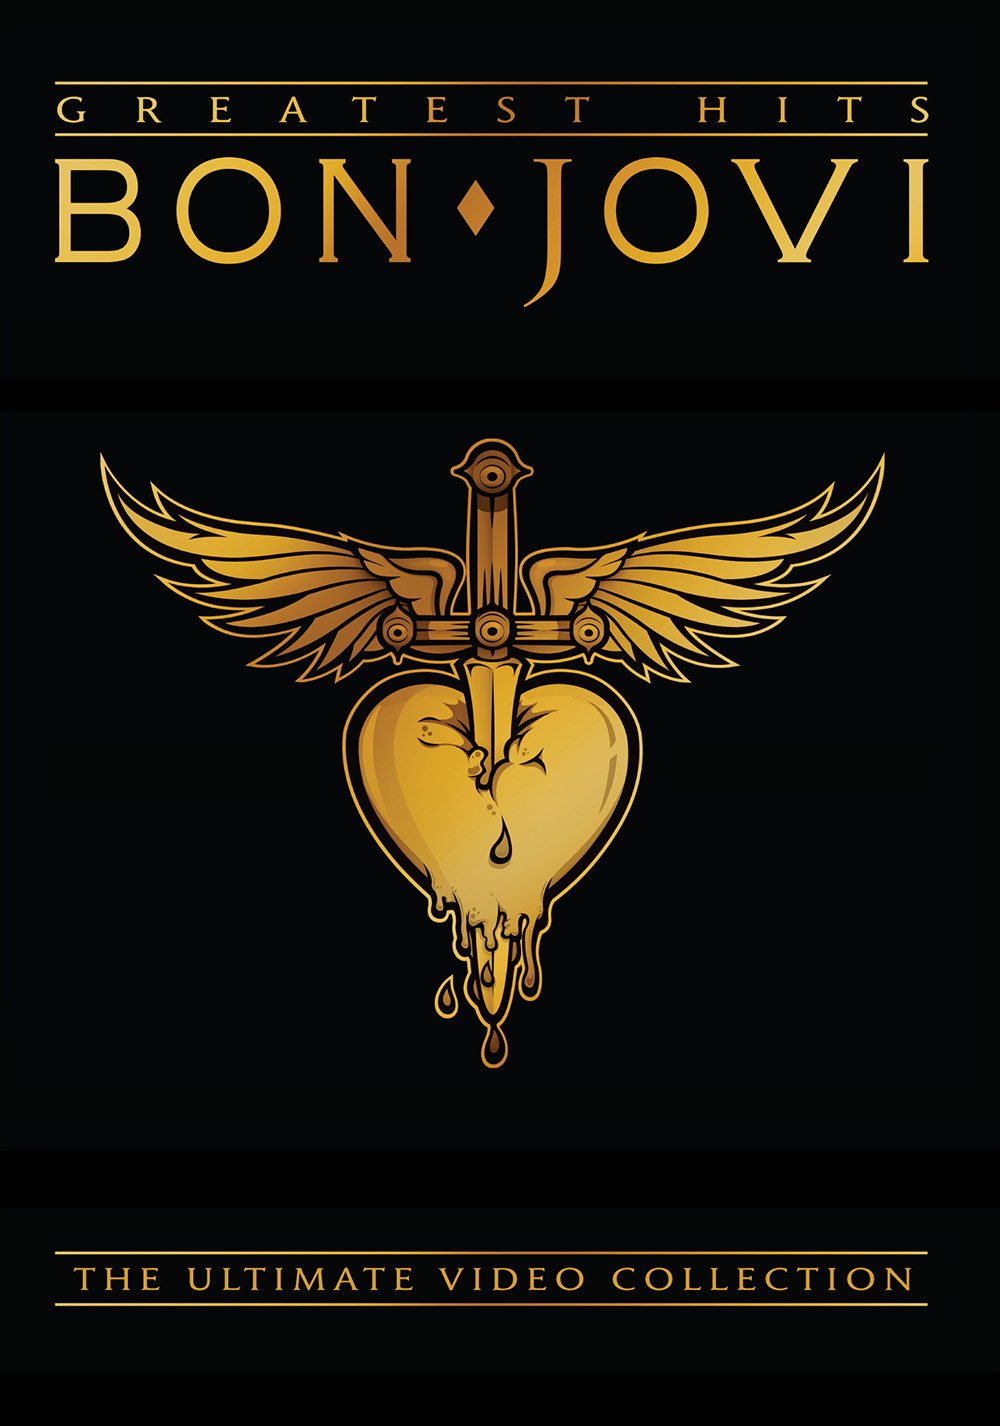 bon jovi greatest hits free album